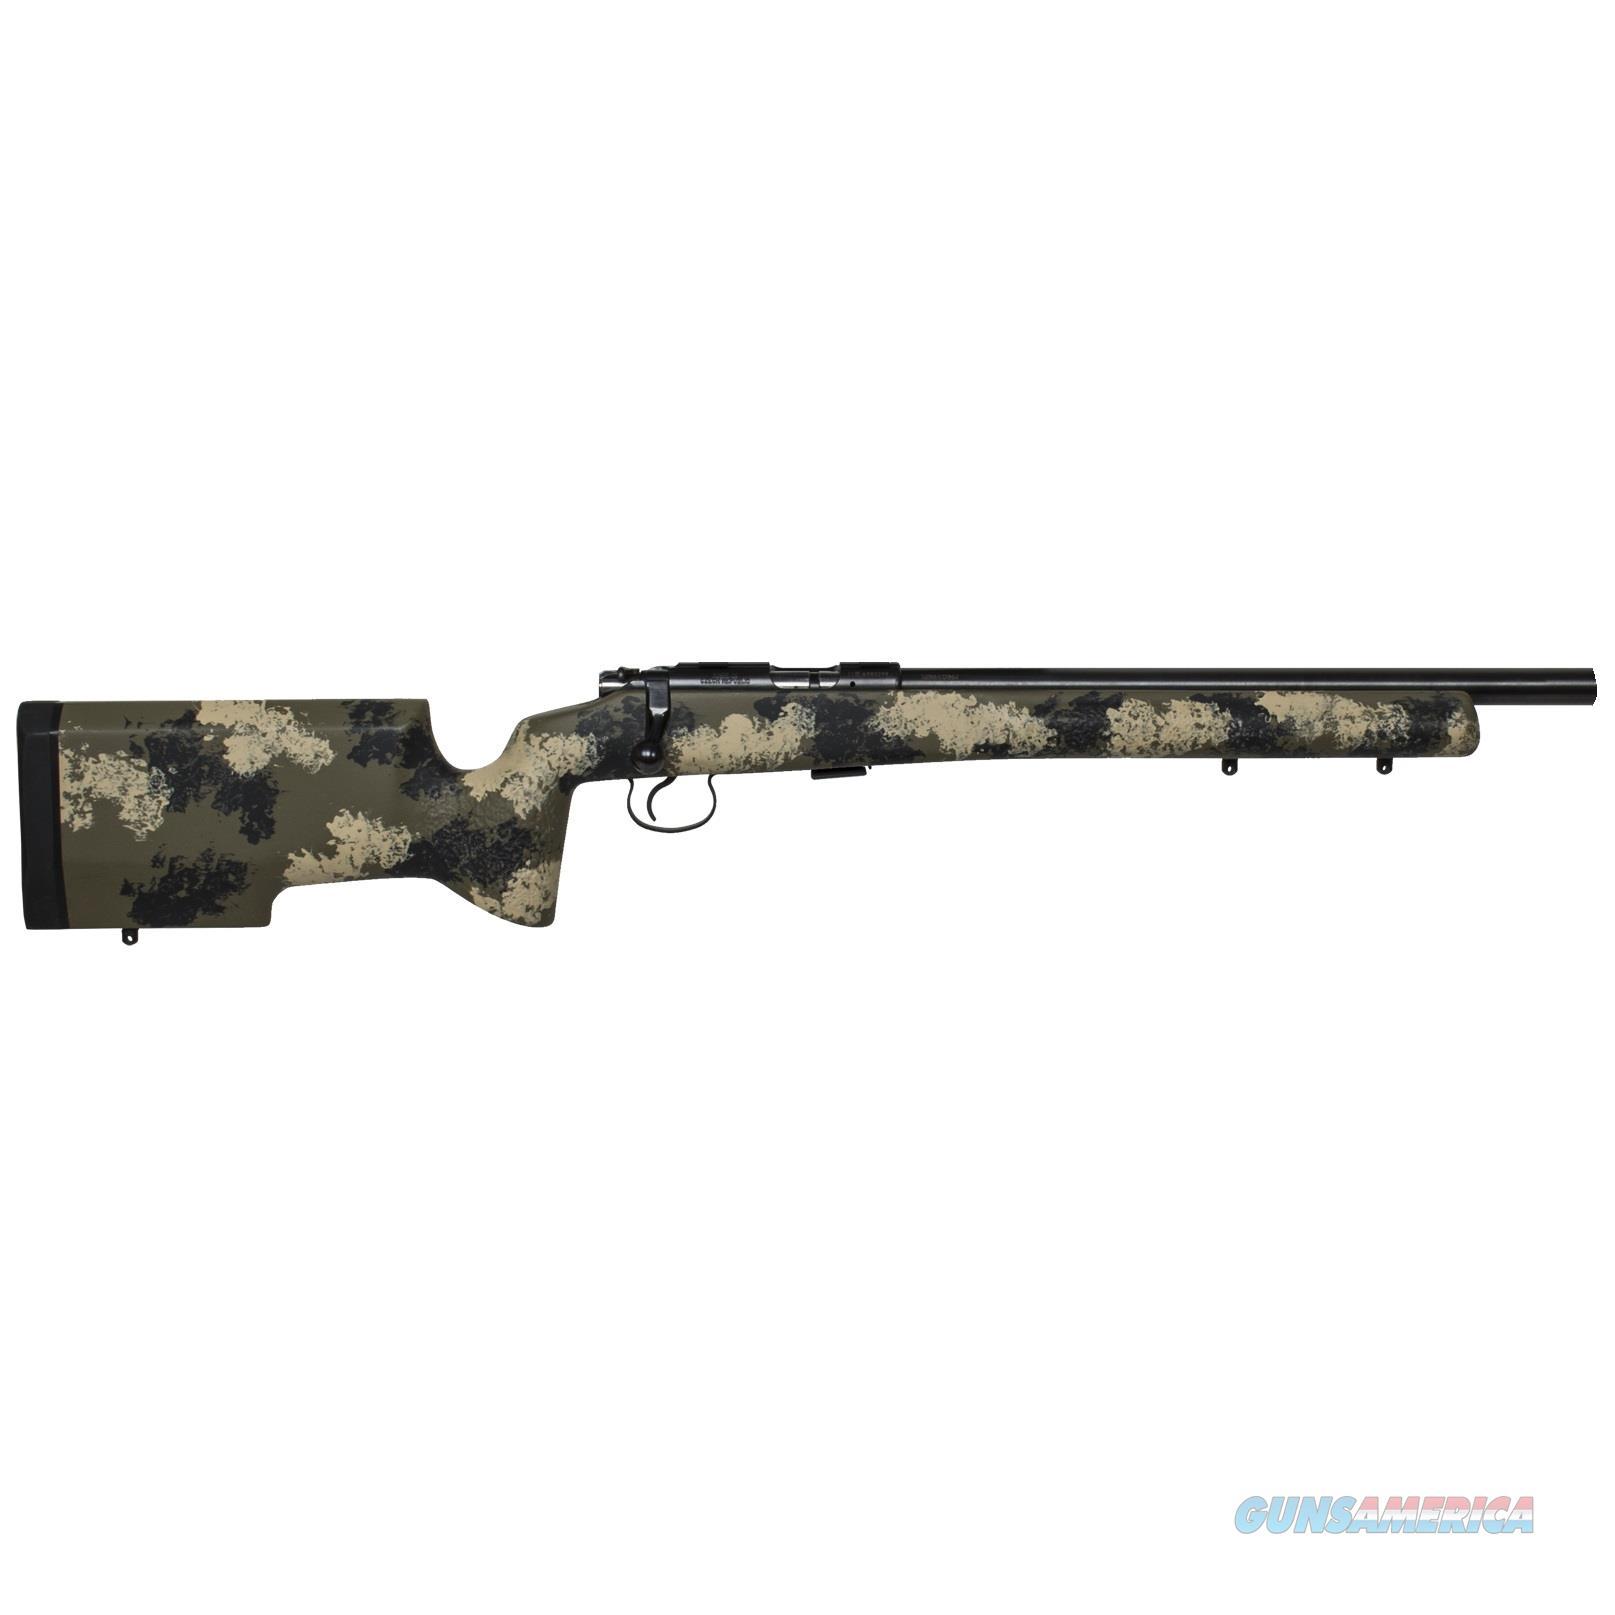 "CZ 455 Varmint Precision Trainer Camo 17"" Threaded Barrel .22 LR 02138  Guns > Rifles > CZ Rifles"